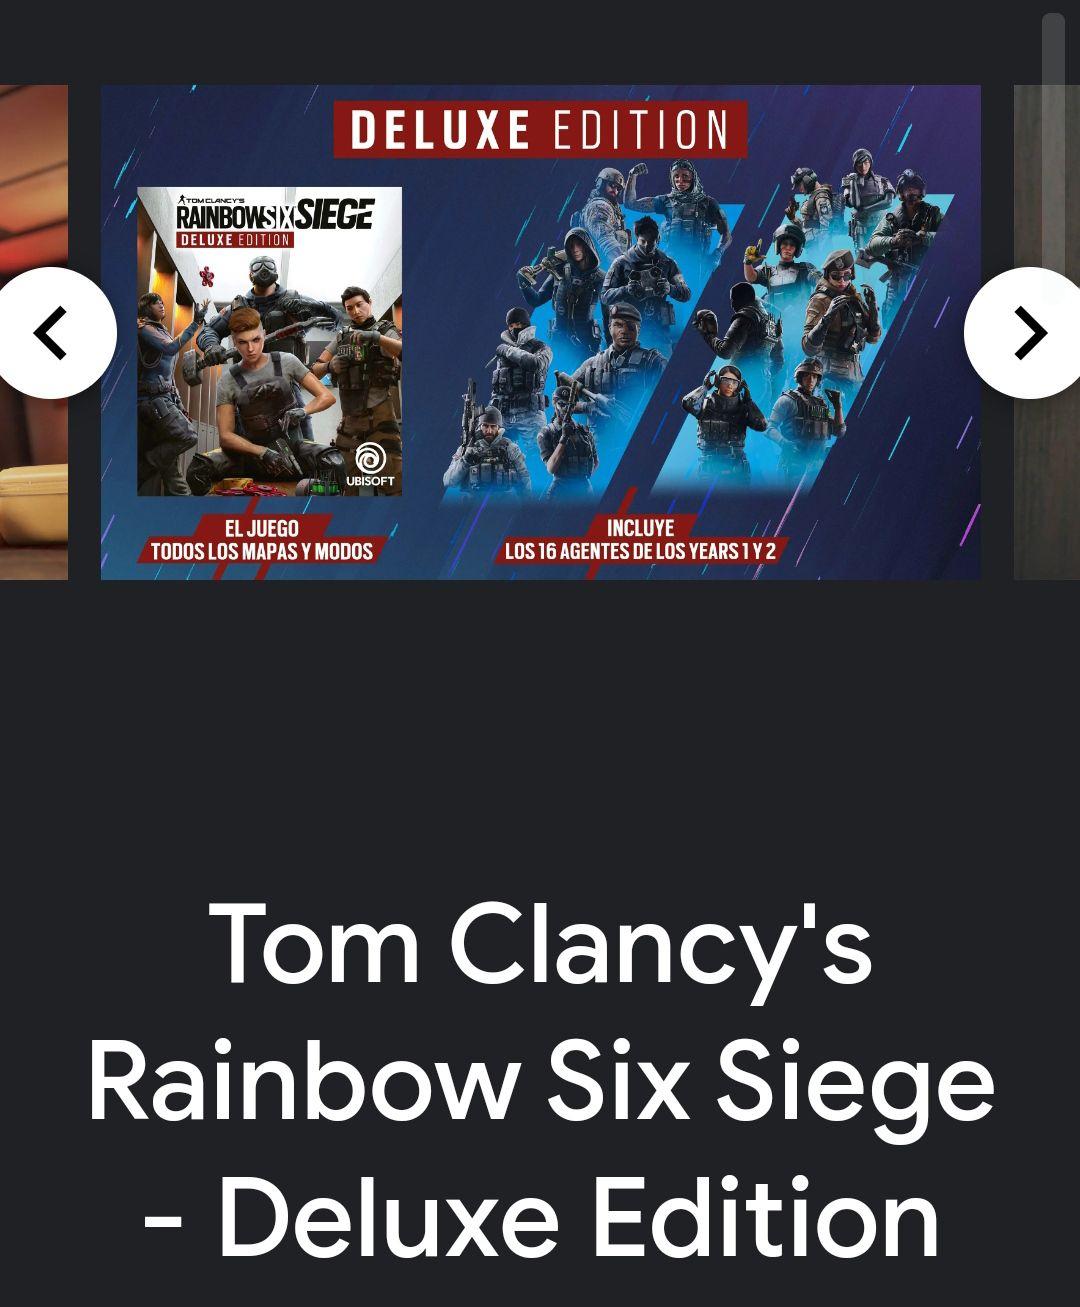 Stadia Tom Clancy's Rainbow Six Siege Deluxe Edition